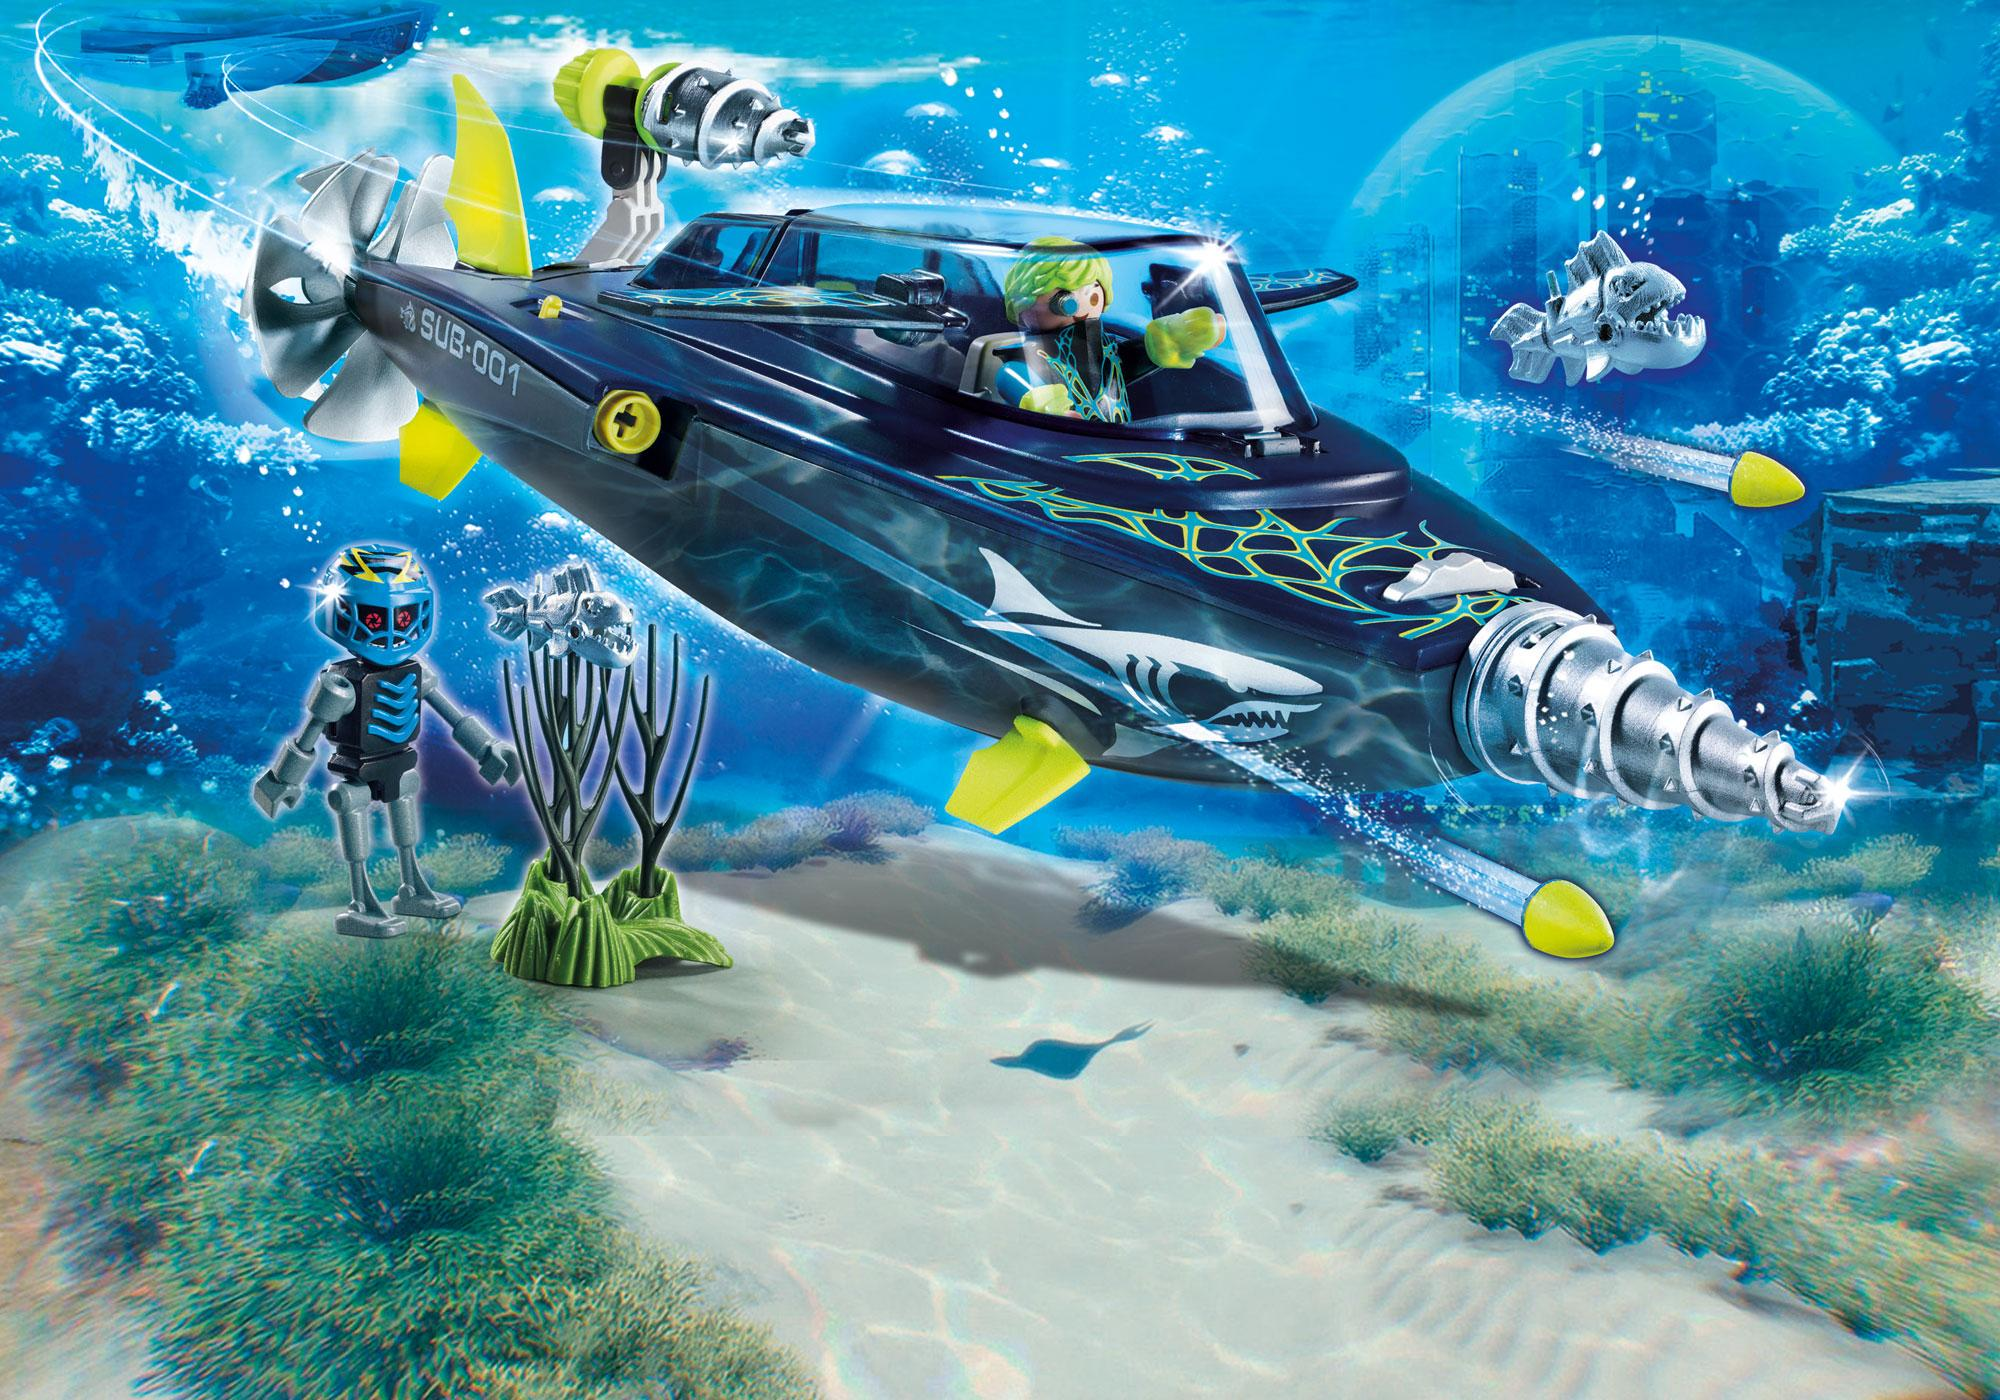 http://media.playmobil.com/i/playmobil/70005_product_detail/TEAM S.H.A.R.K. Attackborr